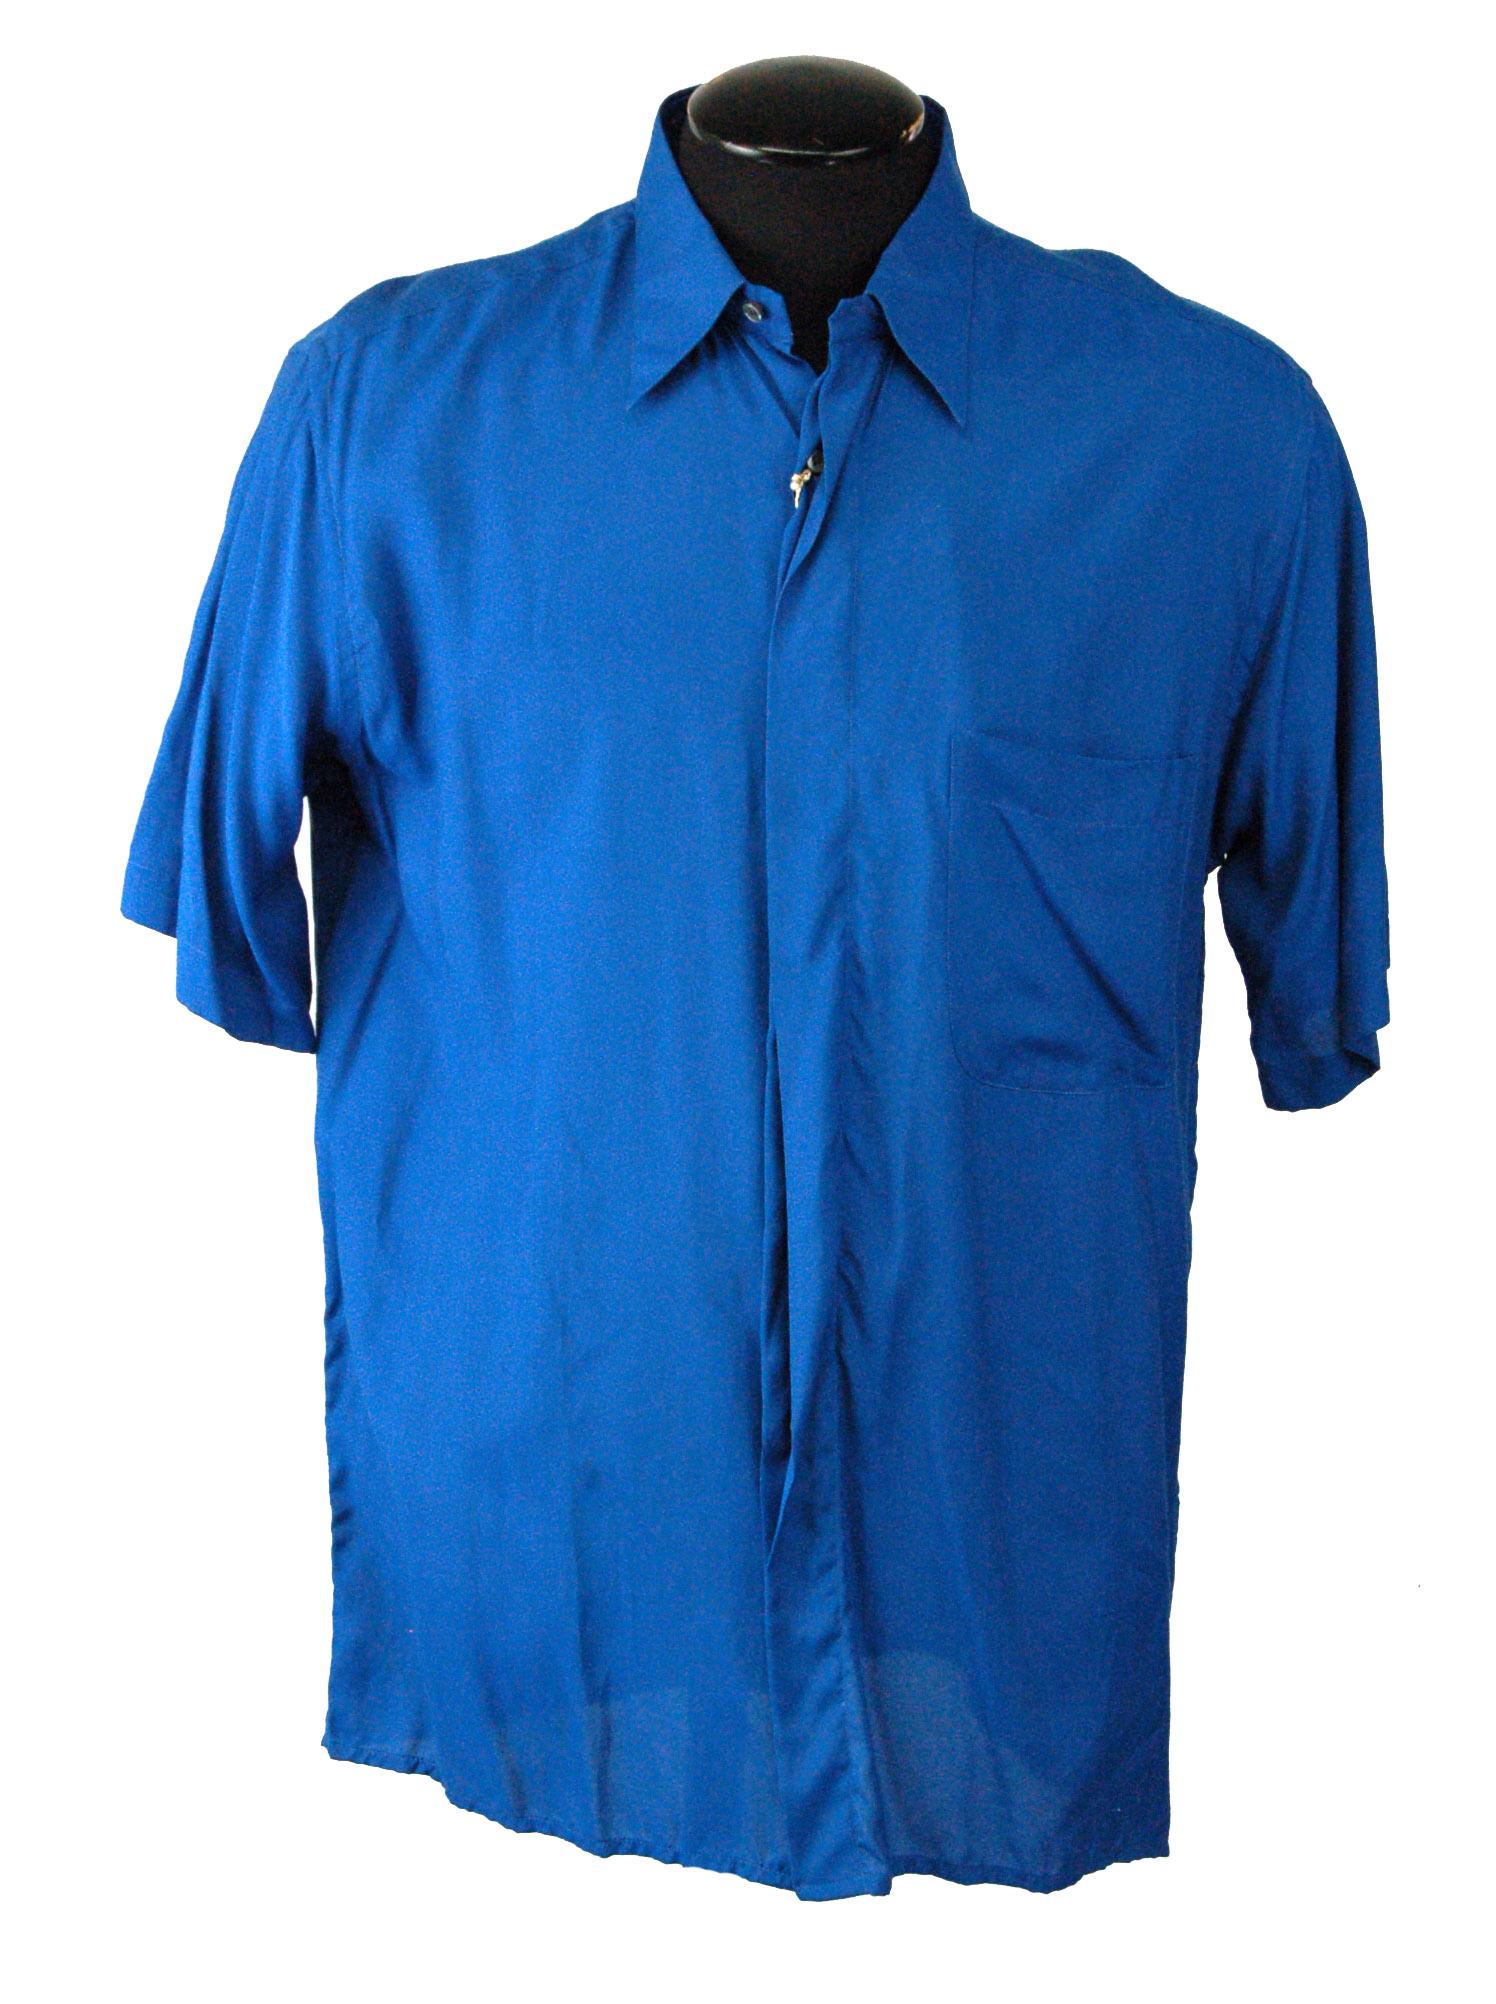 Mens Italian Silk Dress Shirts – Fertilizer Society of Tanzania